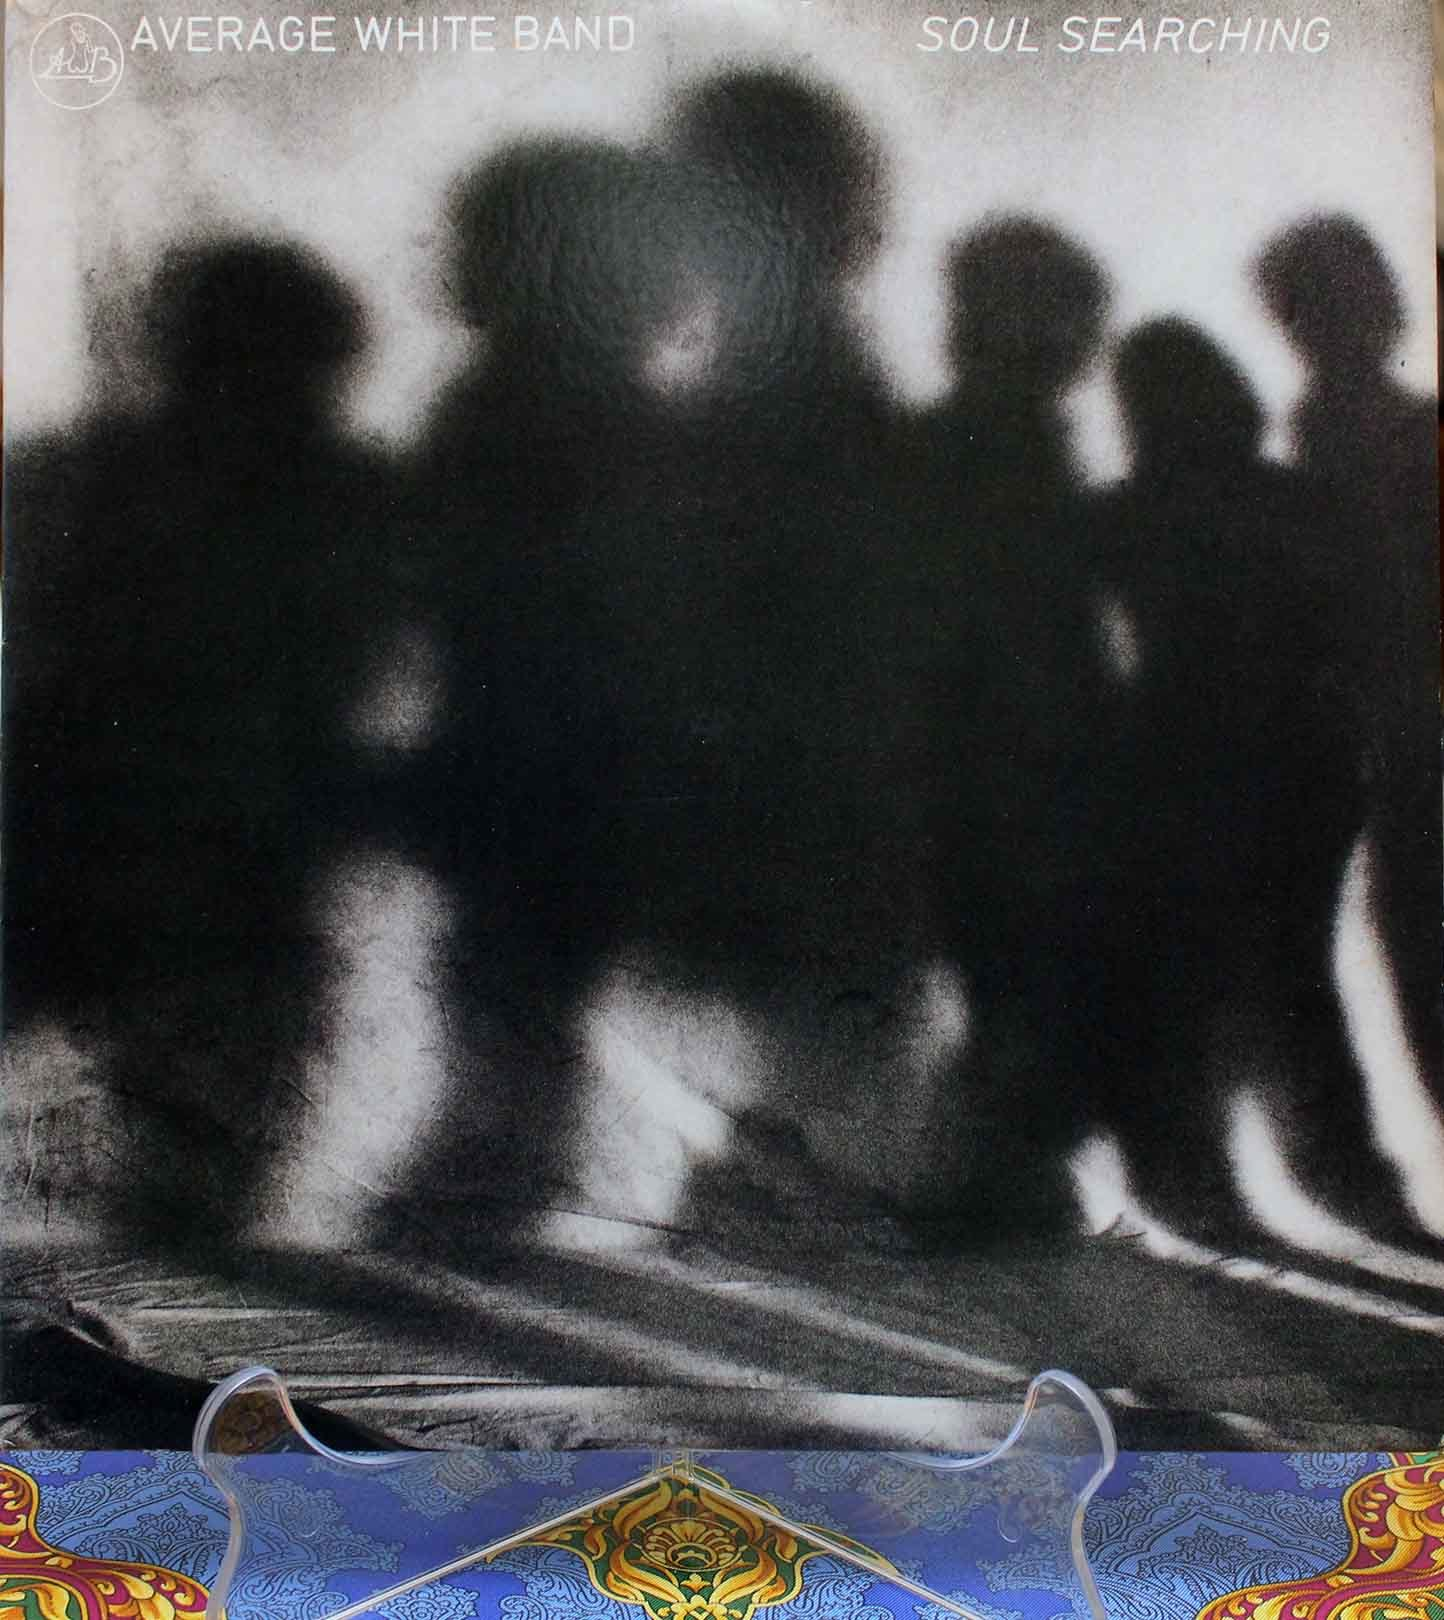 Average White Band – Soul Searching 01